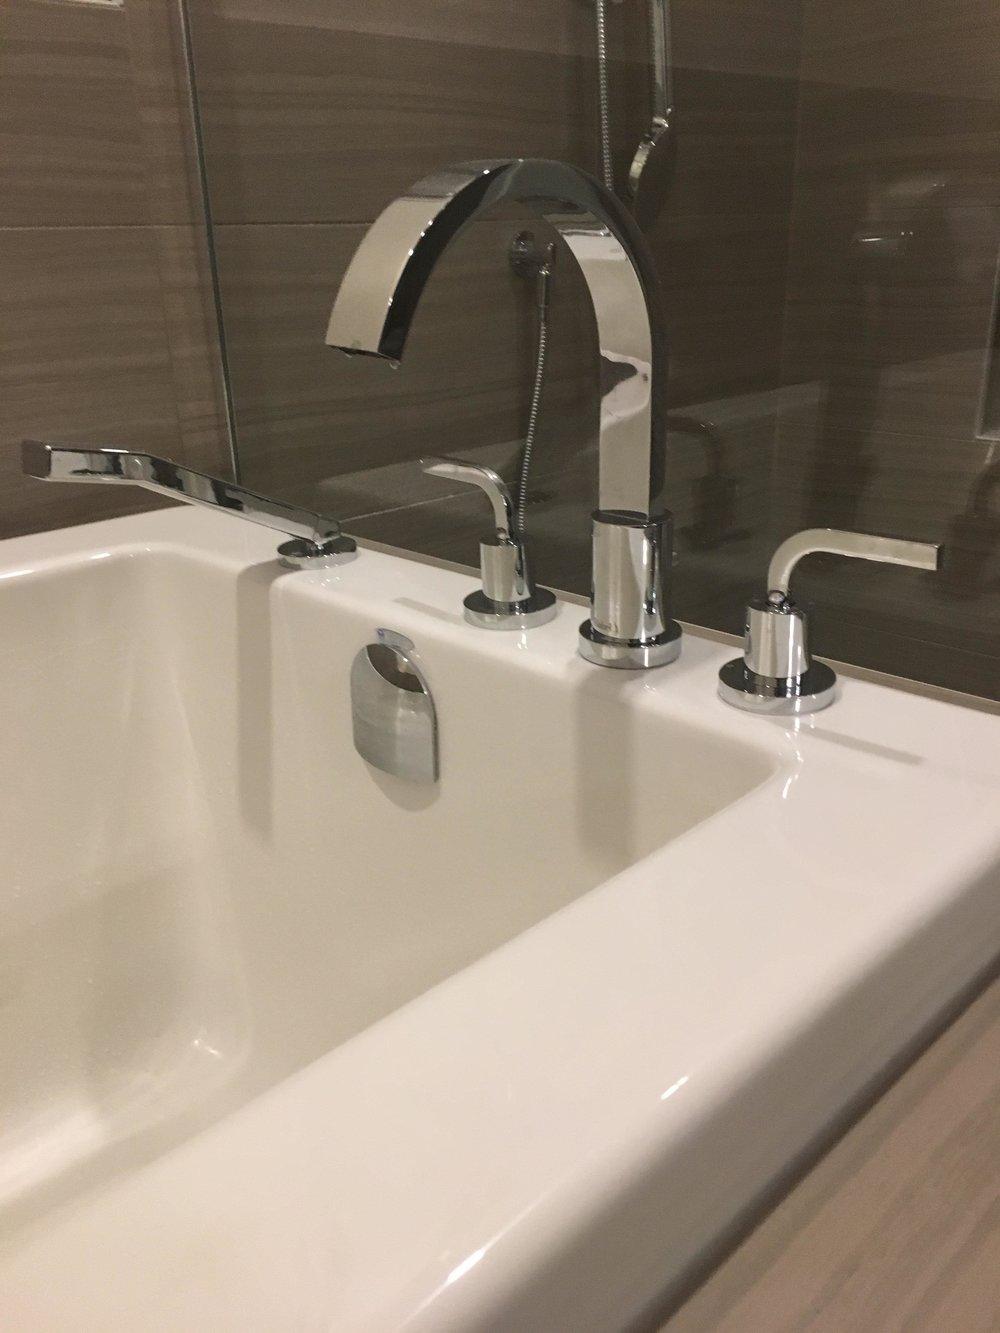 Tub Faucet install